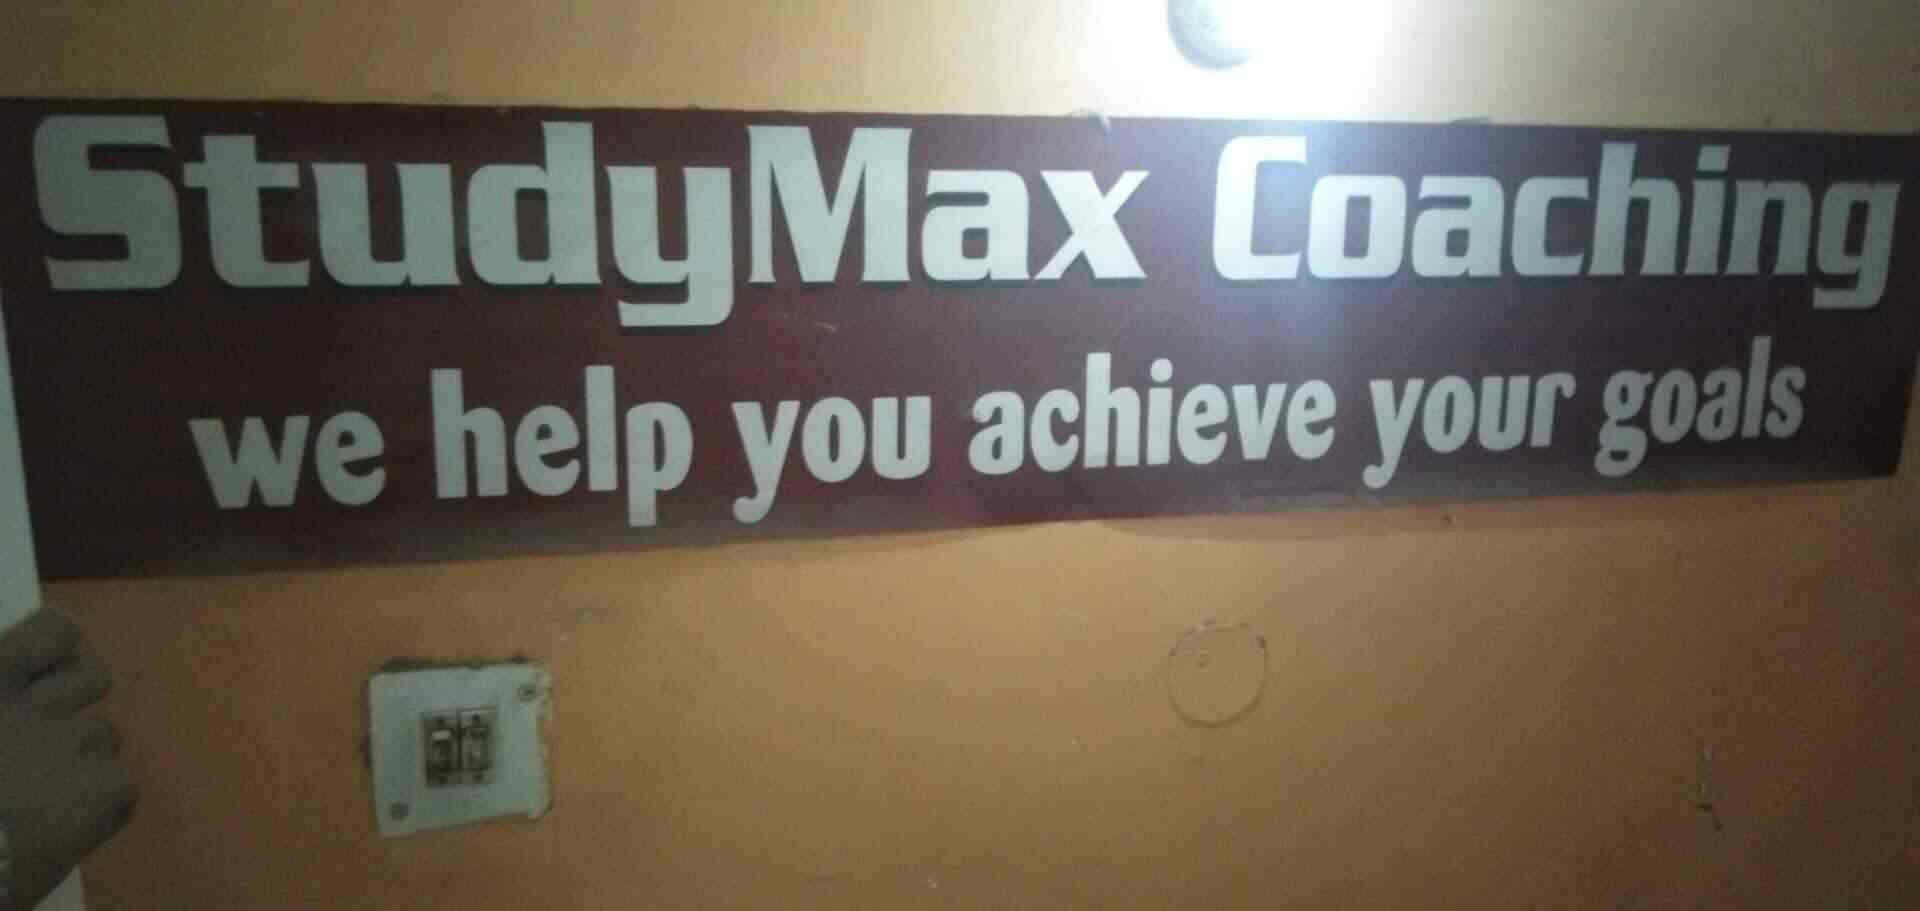 Study Max Coaching Logo